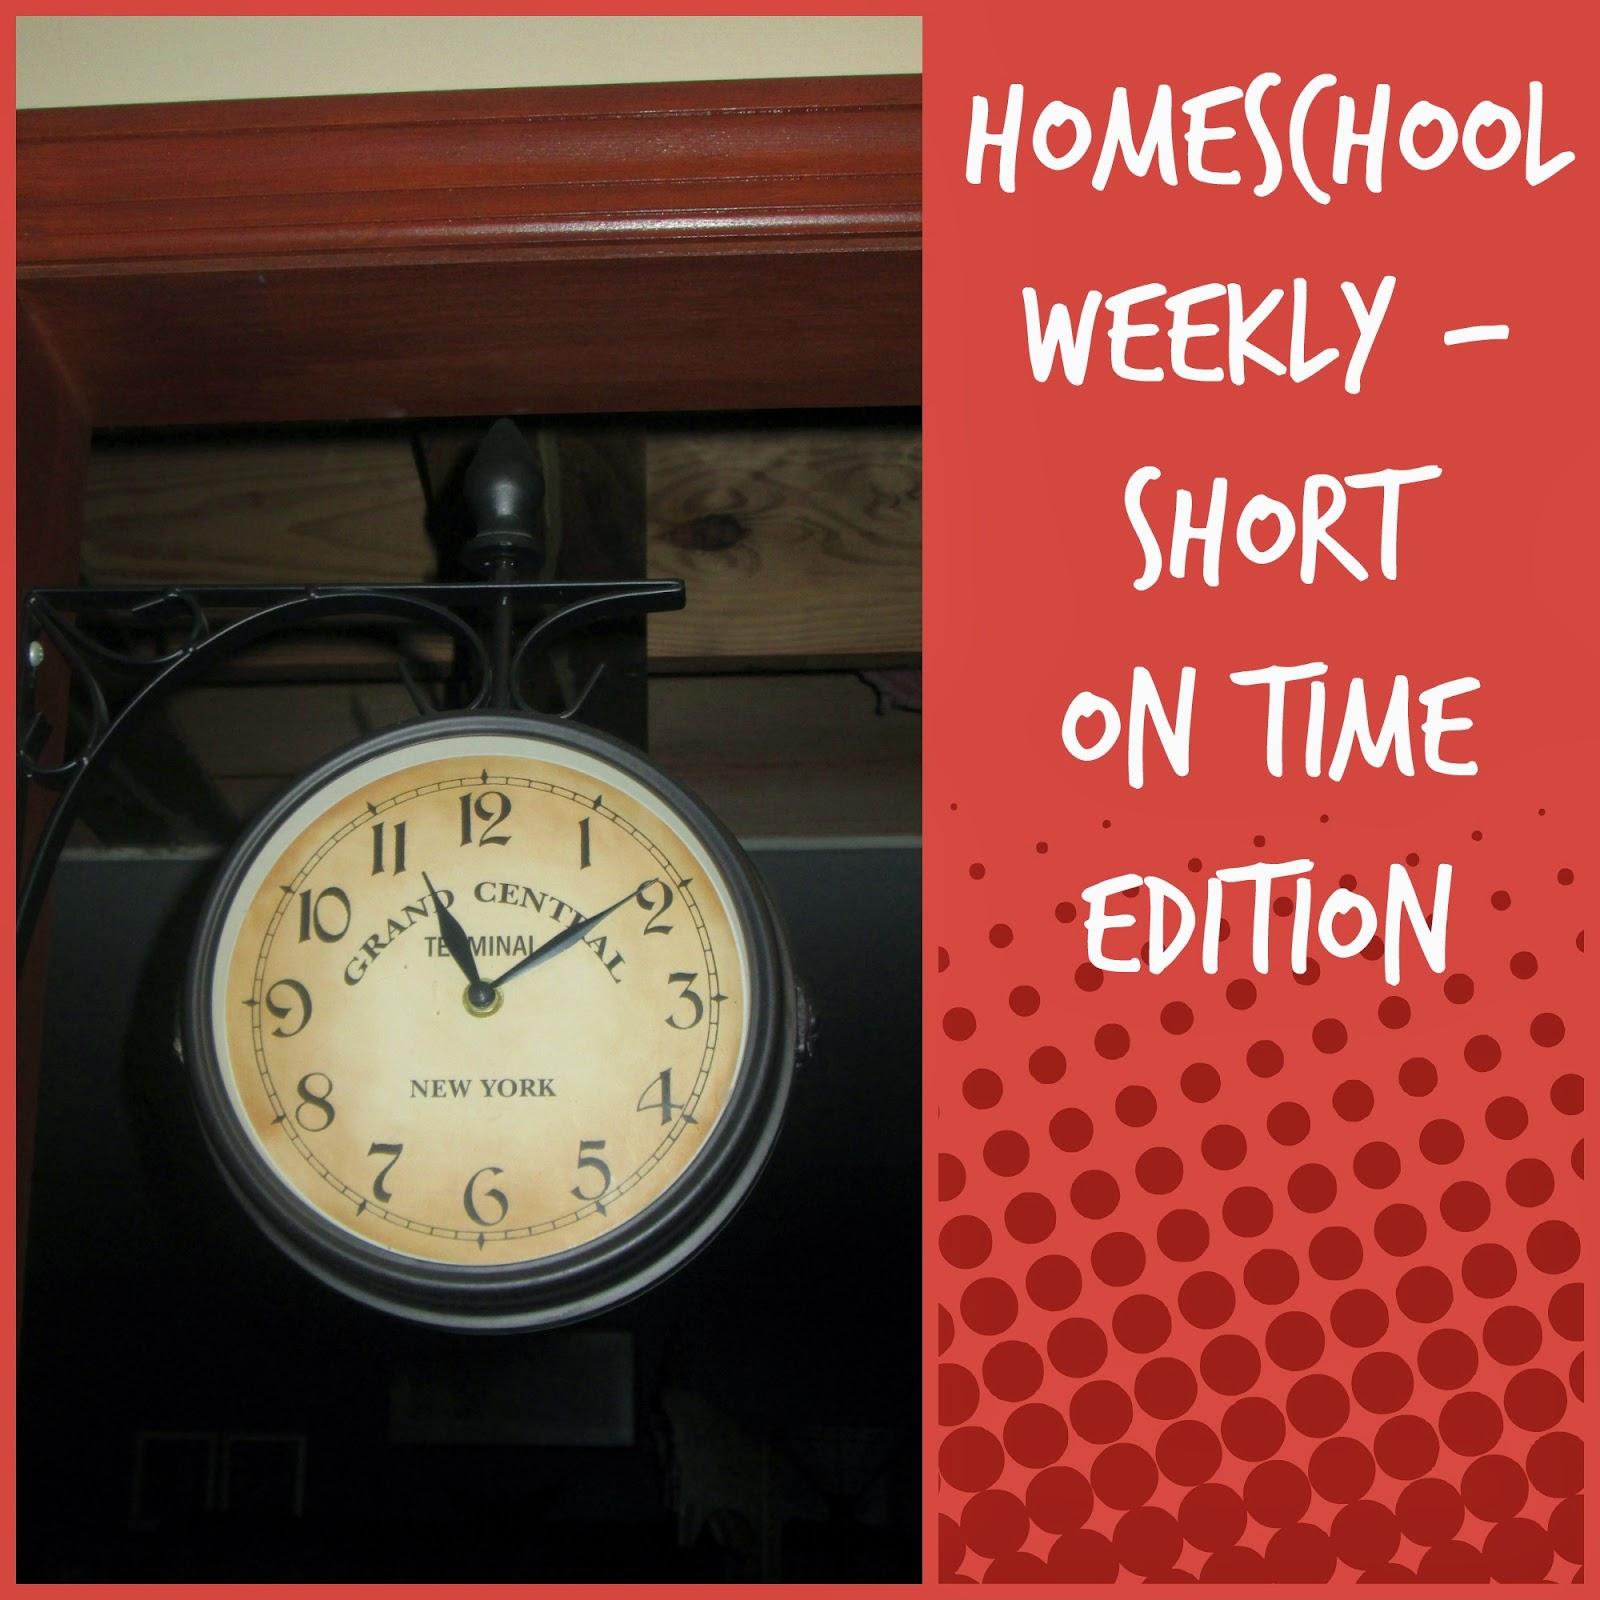 Homeschool Weekly - Short on Time Edition @ Homeschool Coffee Break kympossibleblog.blogspot.com